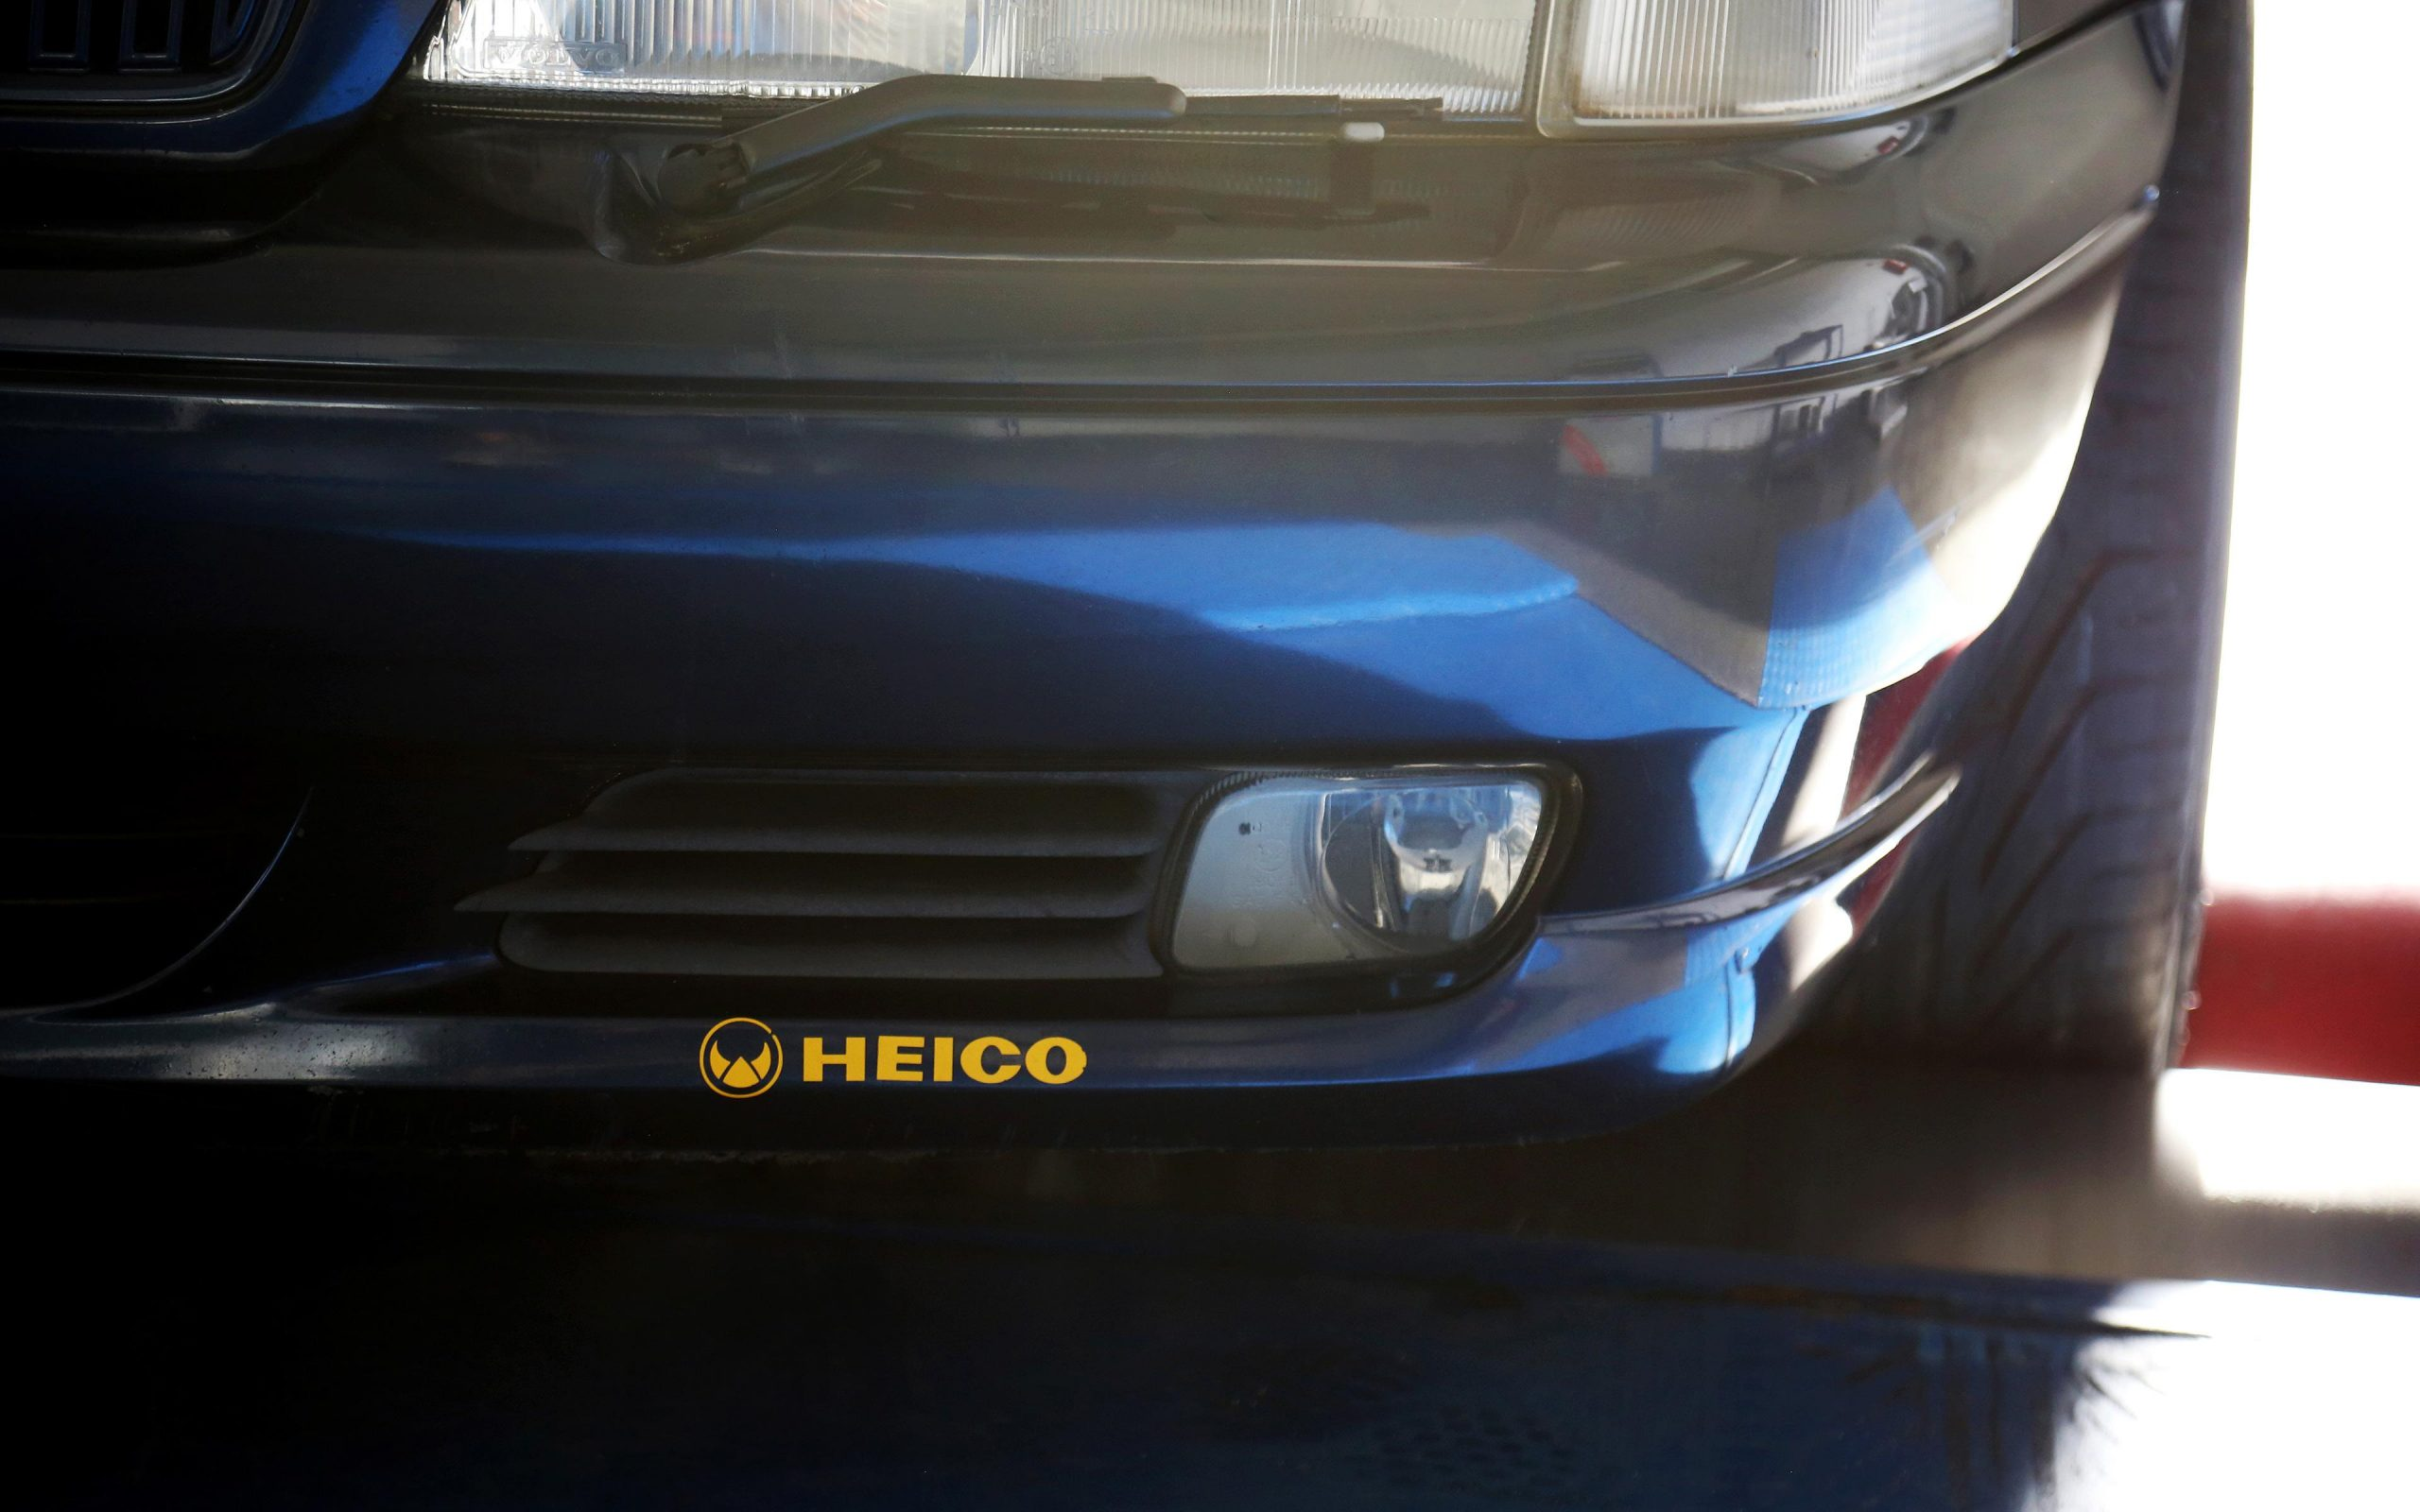 heico-sportiv-V70-edition-1